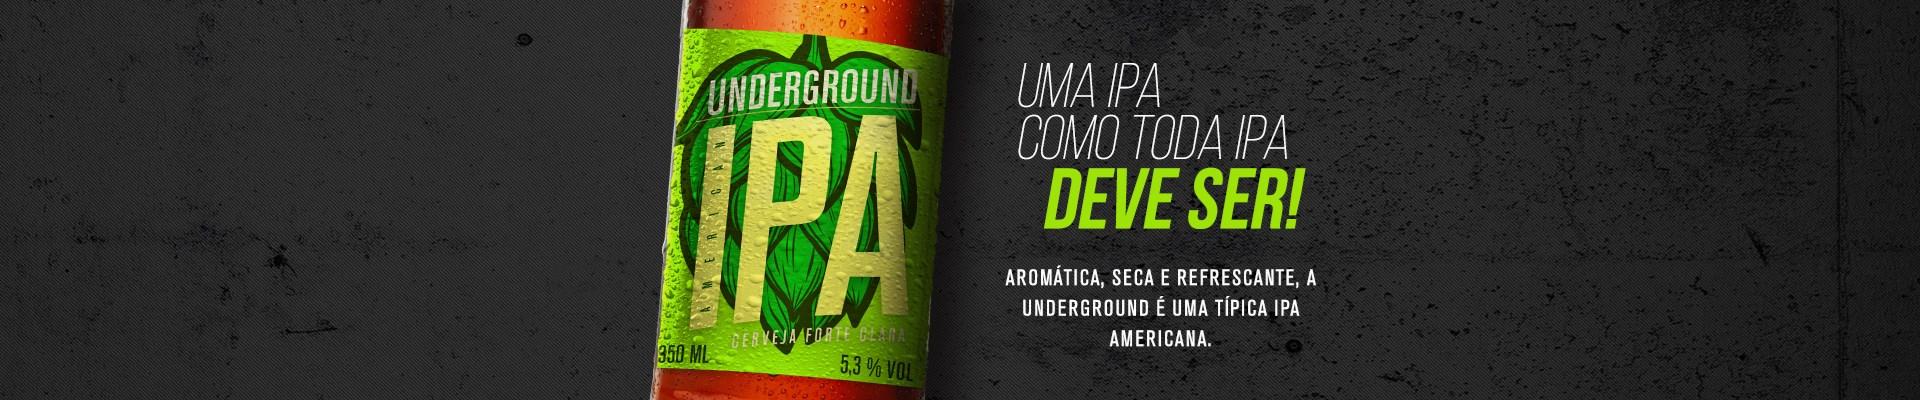 Fabricante Underground